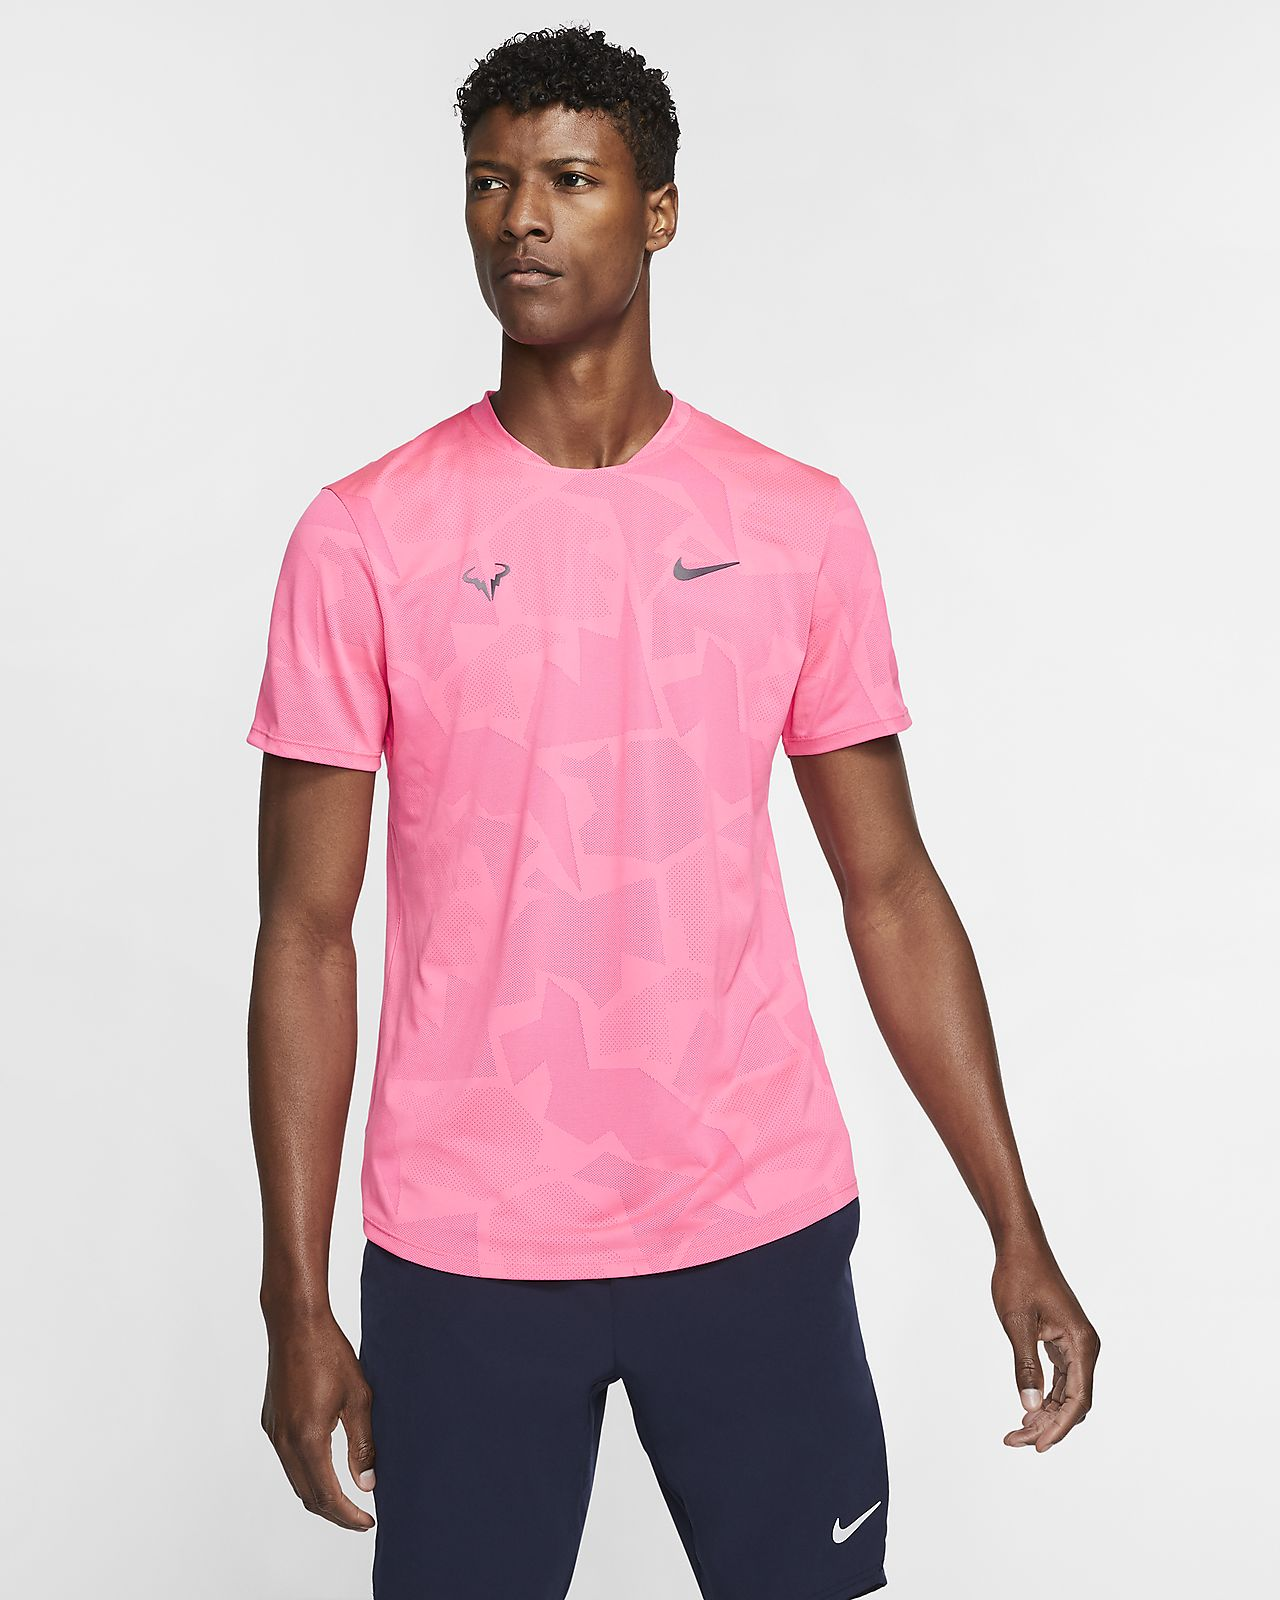 Pánské tenisové tričko NikeCourt AeroReact Rafa s krátkým rukávem